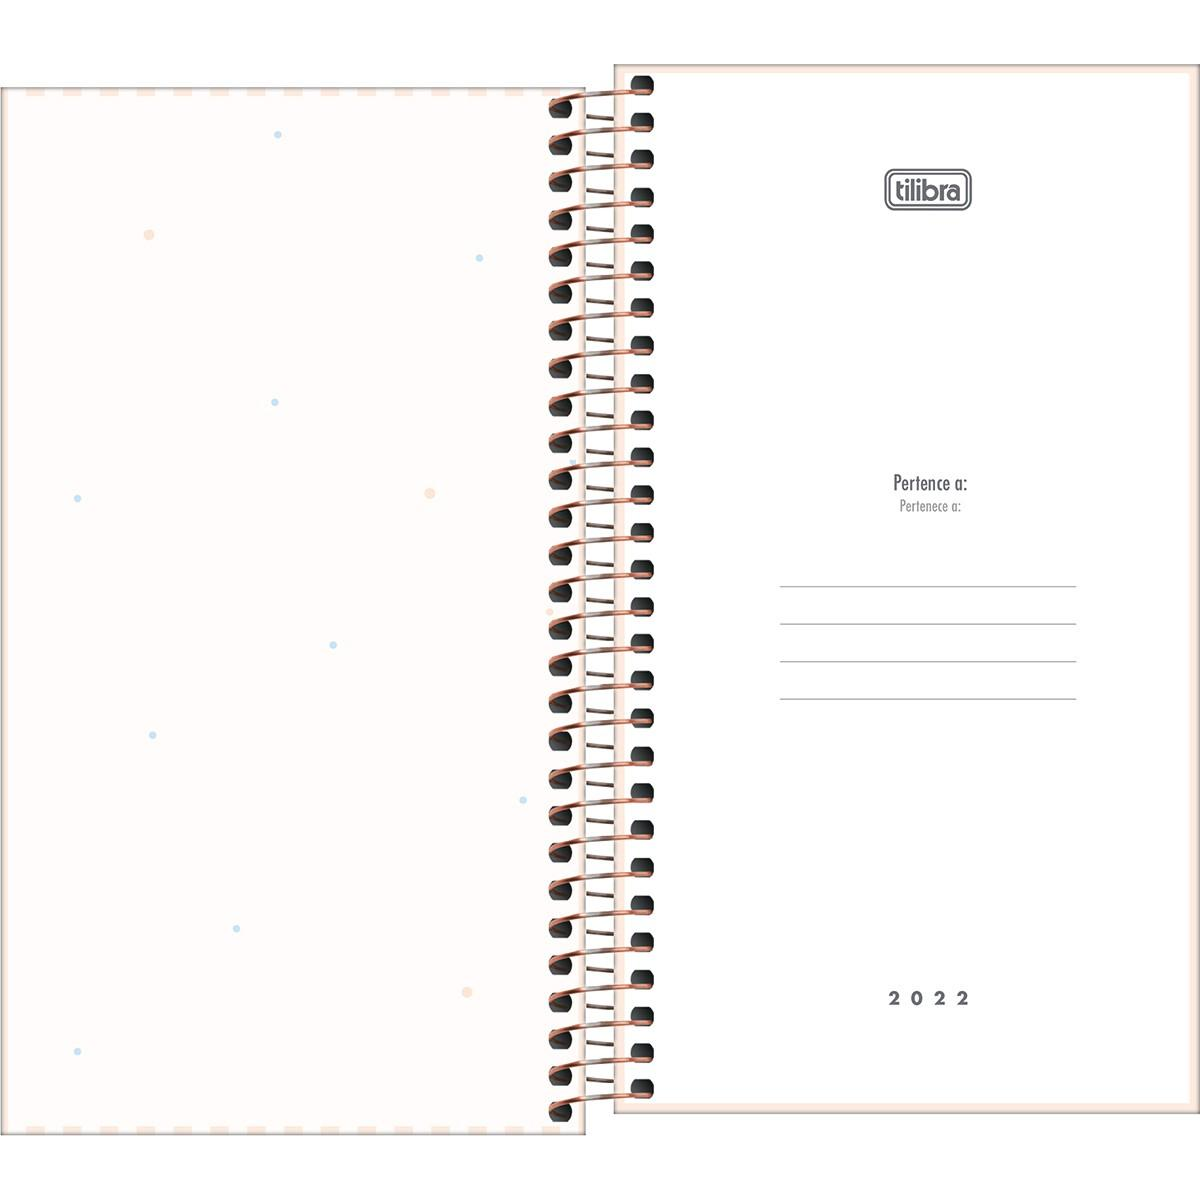 Agenda Espiral Semanal 16,7 x 8,9cm Soho 2022 - Tilibra